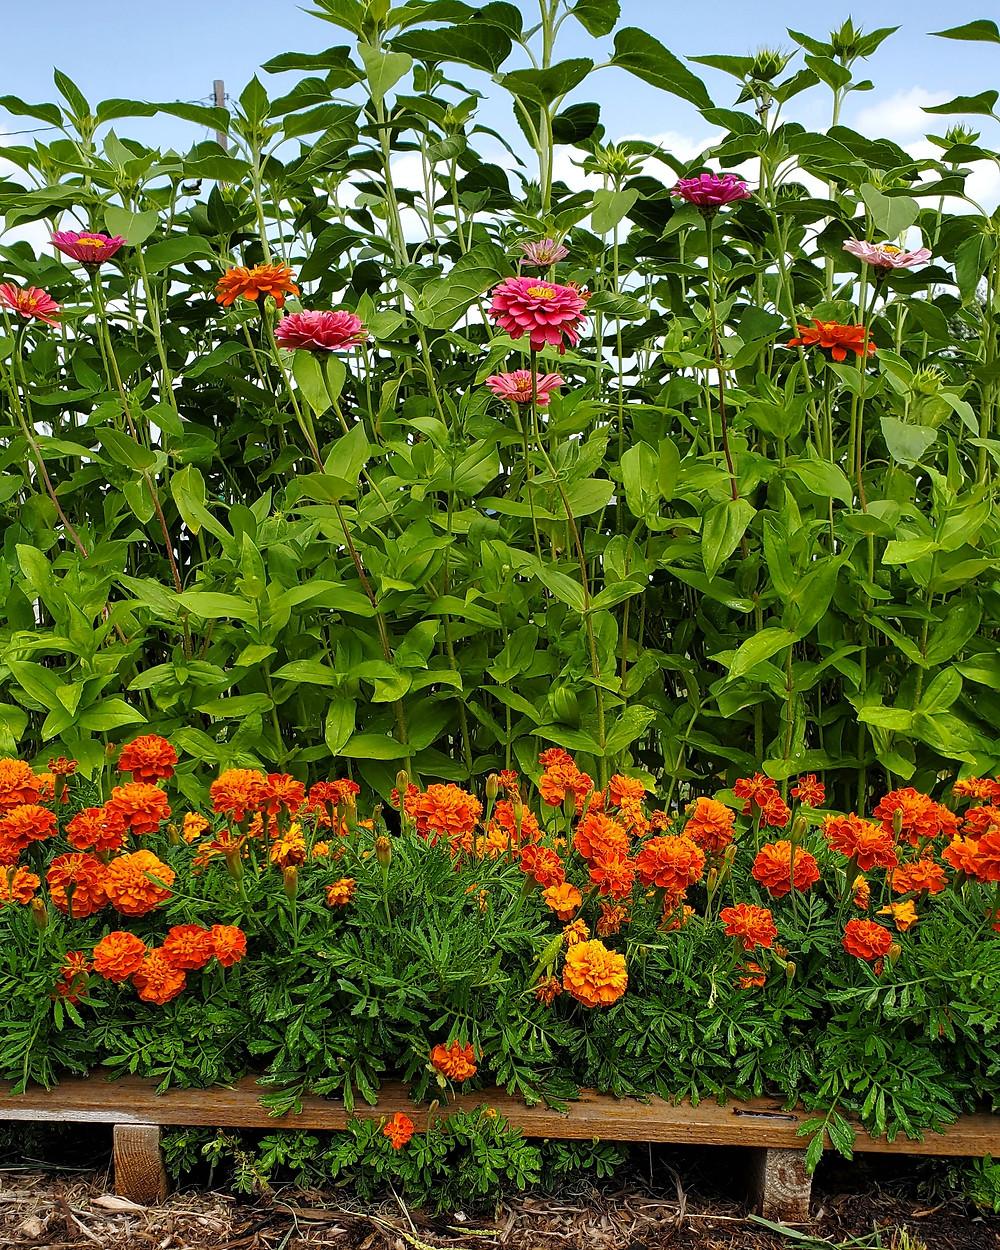 Black Oil Sunflowers, California Giant Zinna's and Marigolds